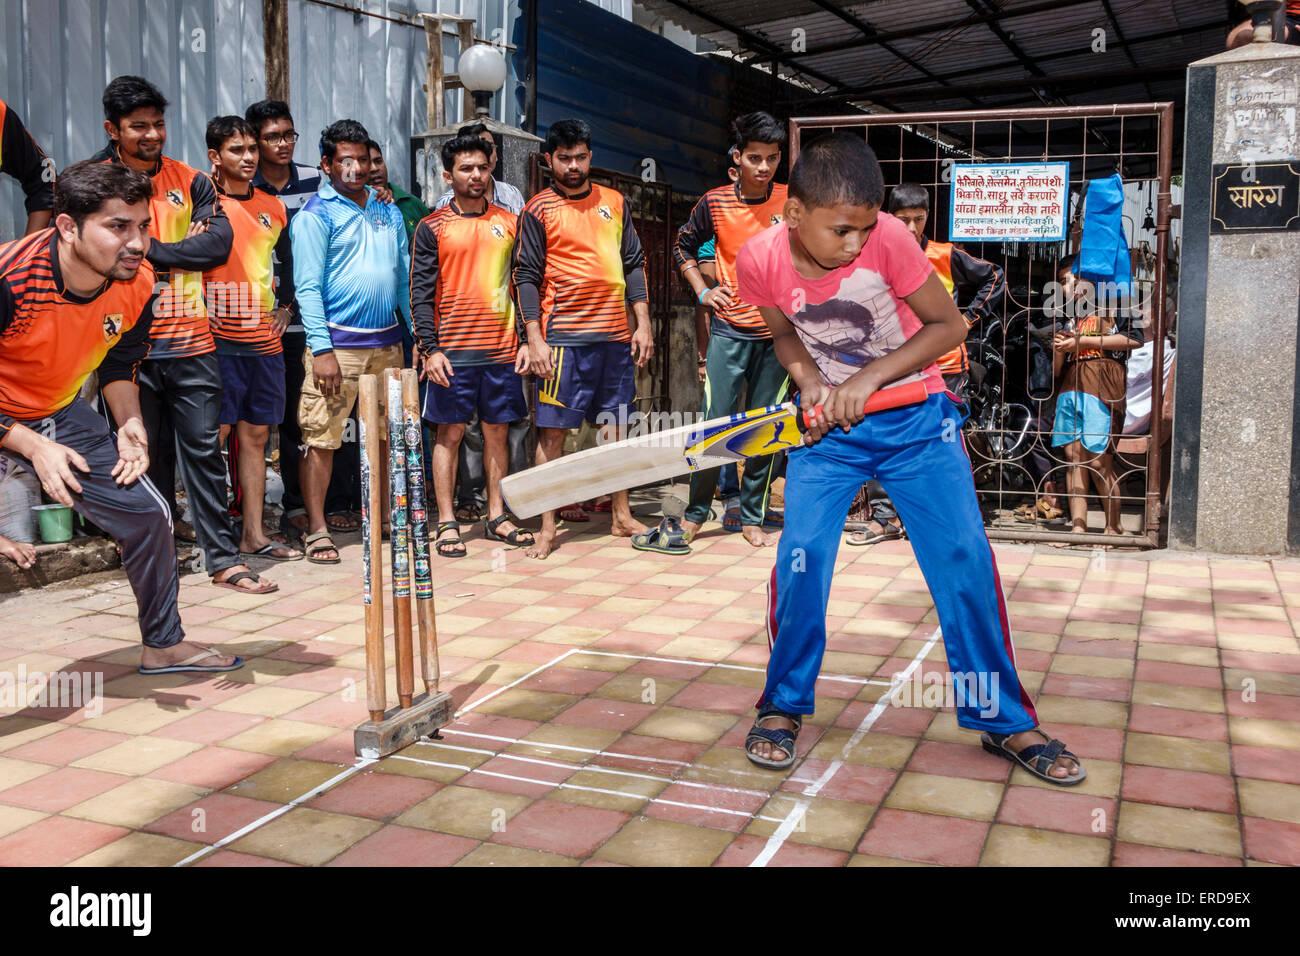 Mumbai India Asian Lower Parel Dhuru Wadi Sitaram Jadhav Marg box cricket game charity event bat player man boy - Stock Image